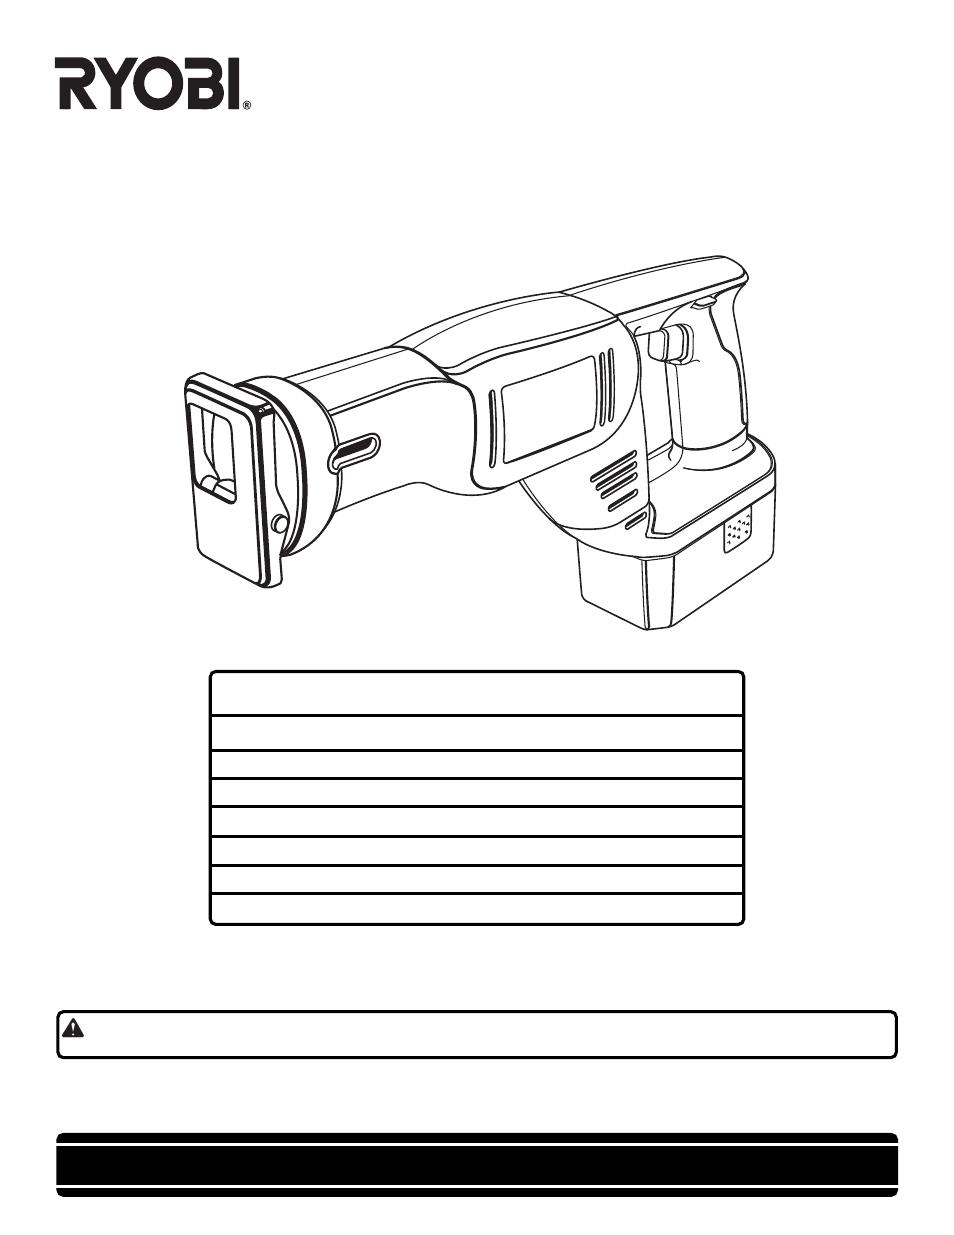 ryobi rjc180 user manual 14 pages rh manualsdir com Ryobi String Trimmer Parts Ryobi String Trimmer Parts